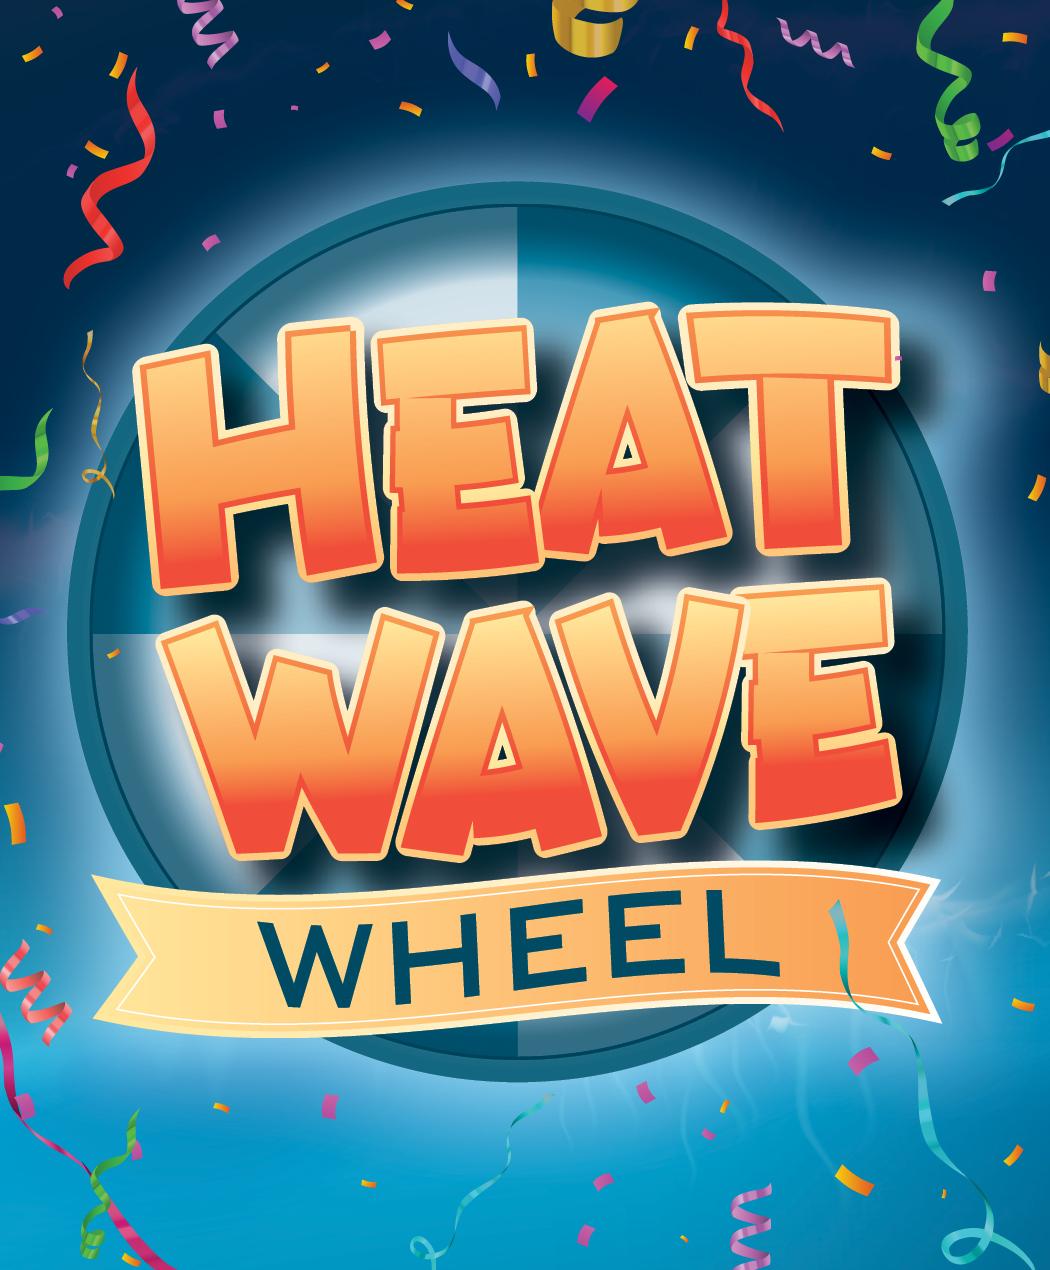 Anniversary Heat Wave Wheel